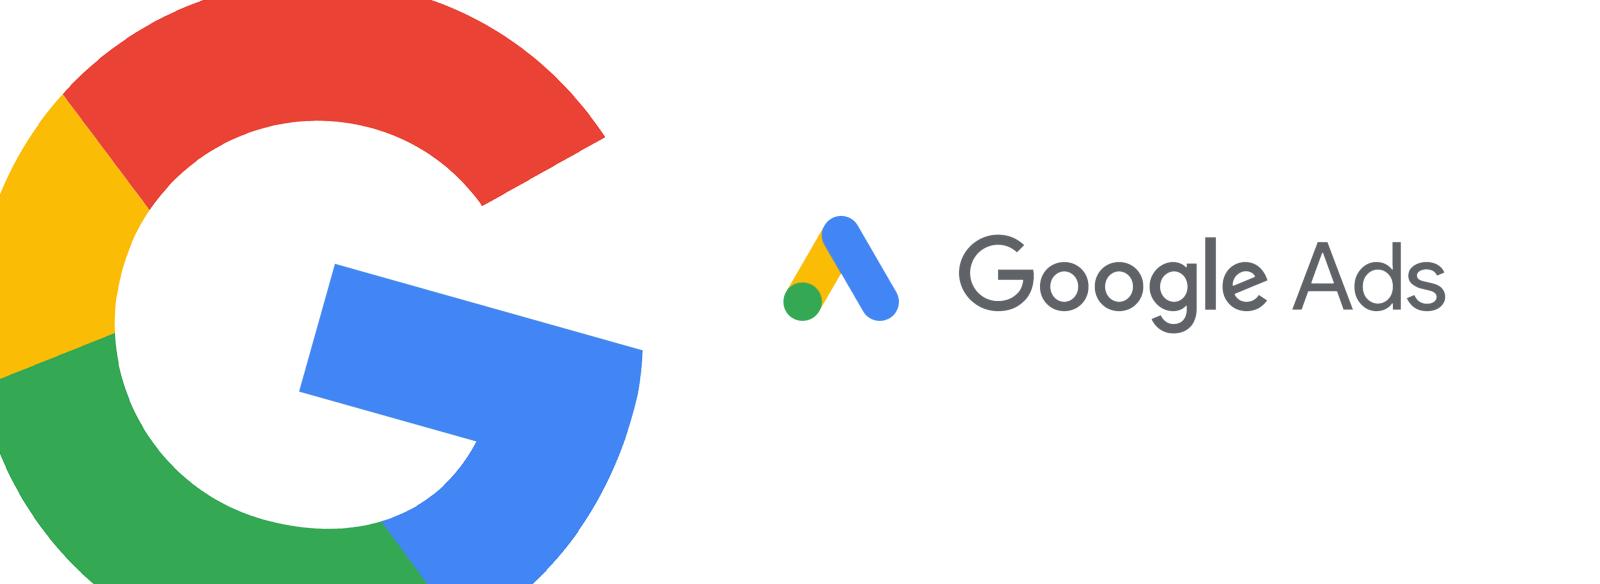 GoogleAds 1600x584 1 - Google Reklamları